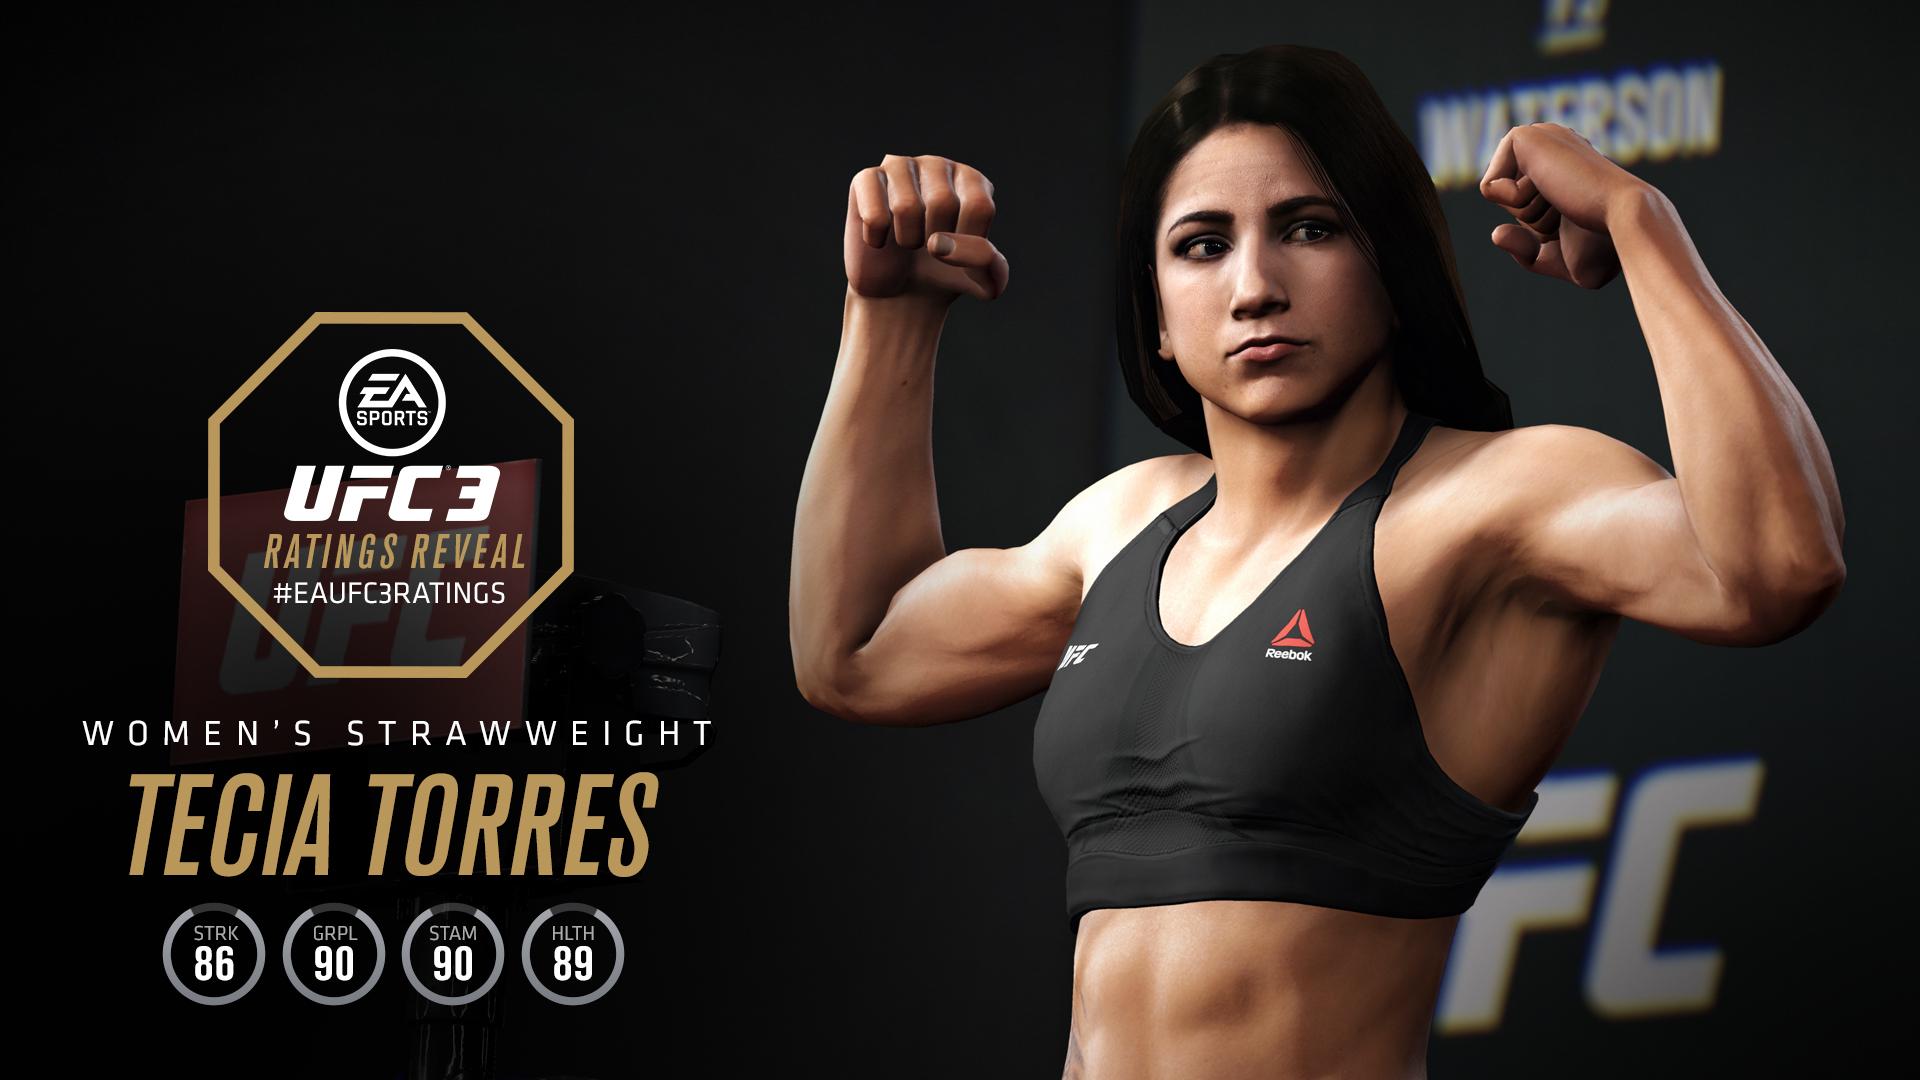 TecciaTorres_WomensStrawweight_1920x1080